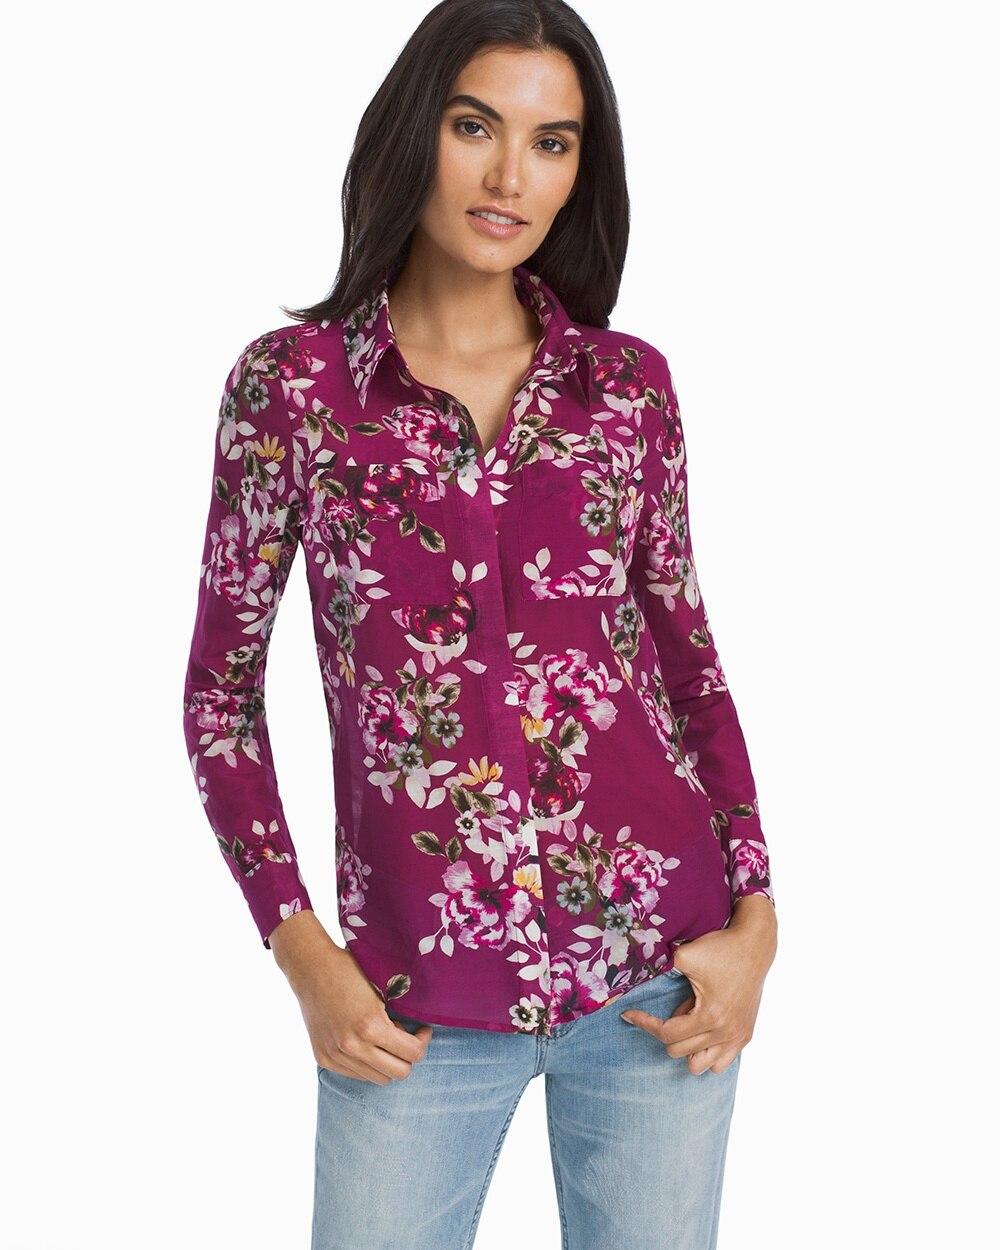 d7f094f1fca82c Floral Button-Up Shirt - Women's Shirts - Denim, Poplin, Soft Shirts & More  - White House Black Market